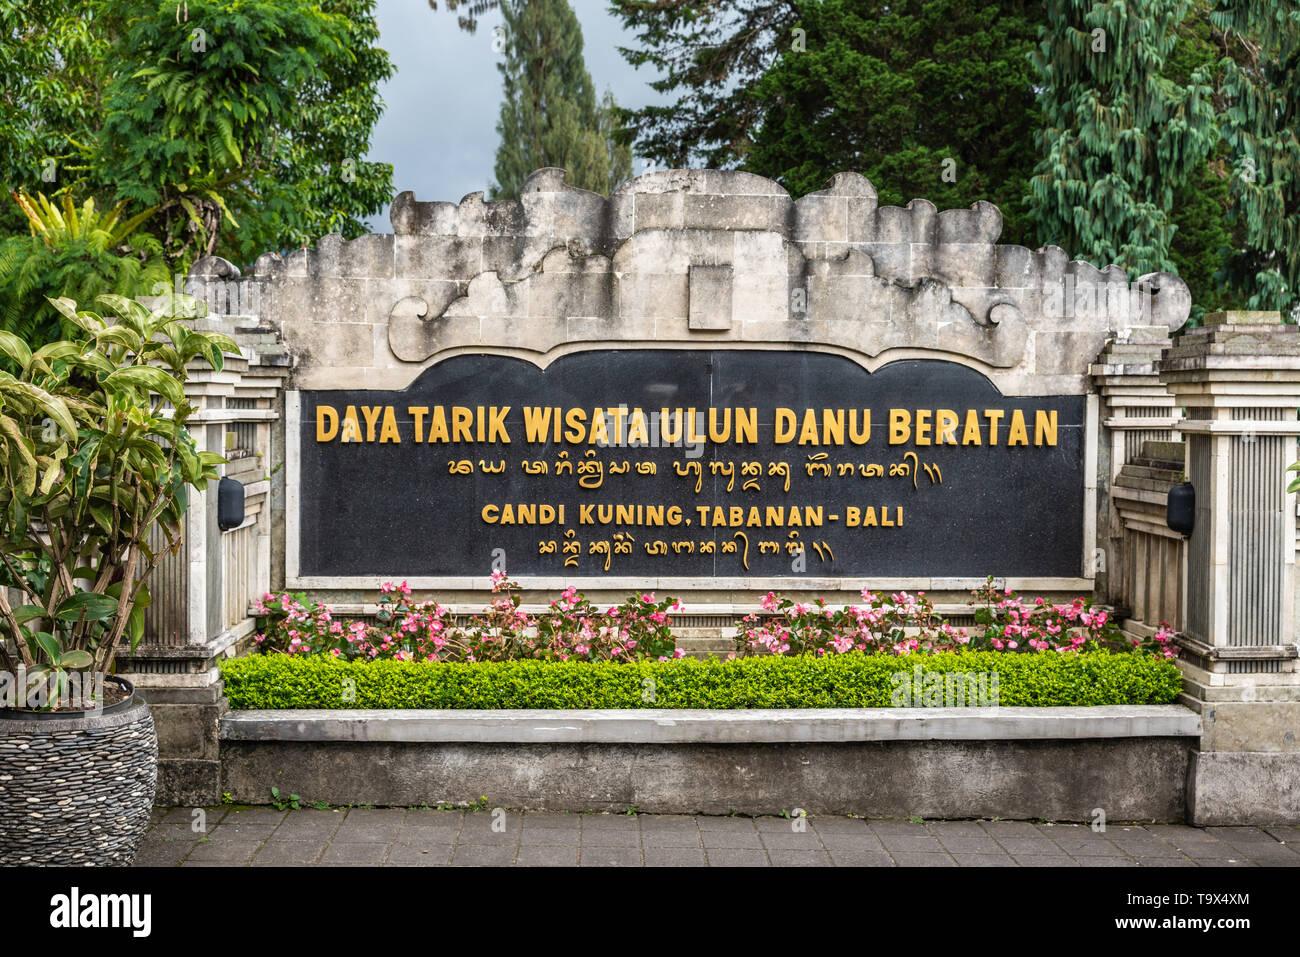 Bali Indonesia February 25 2019 Ulun Danu Beratan